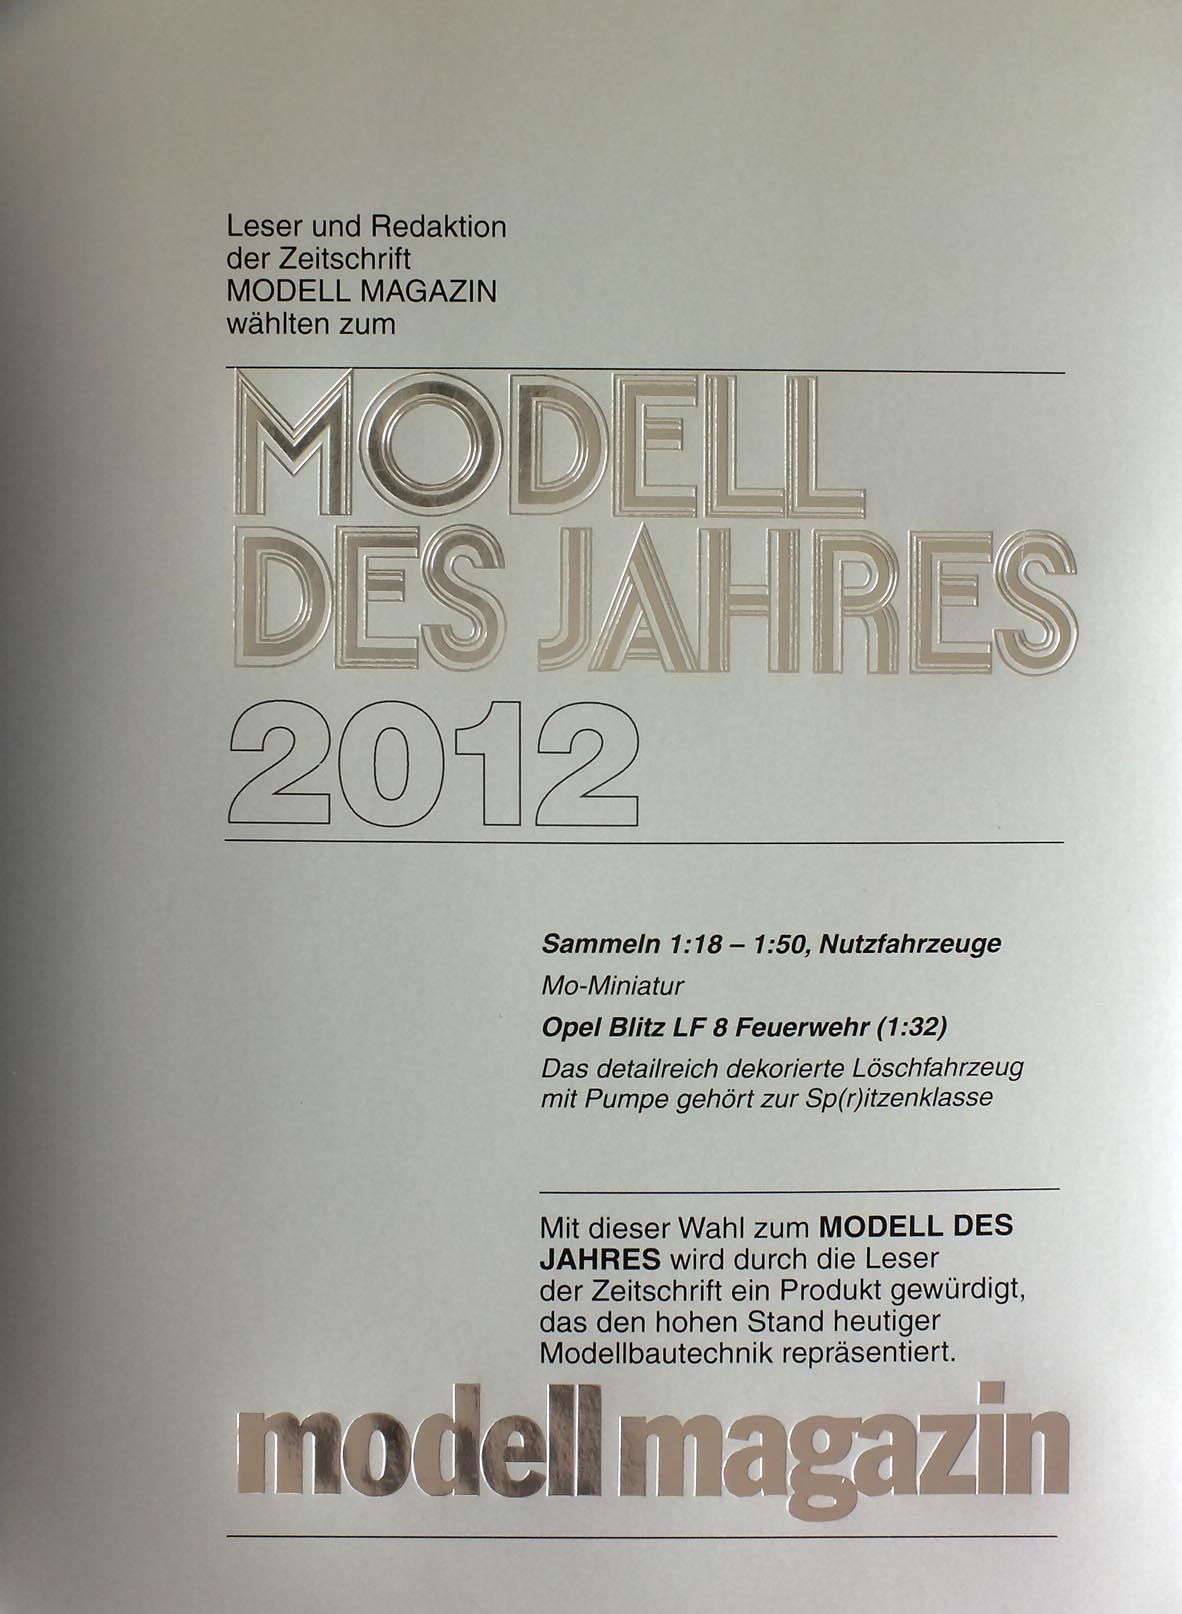 Urkunde Modell des Jahres der MODELL MAGAZINs